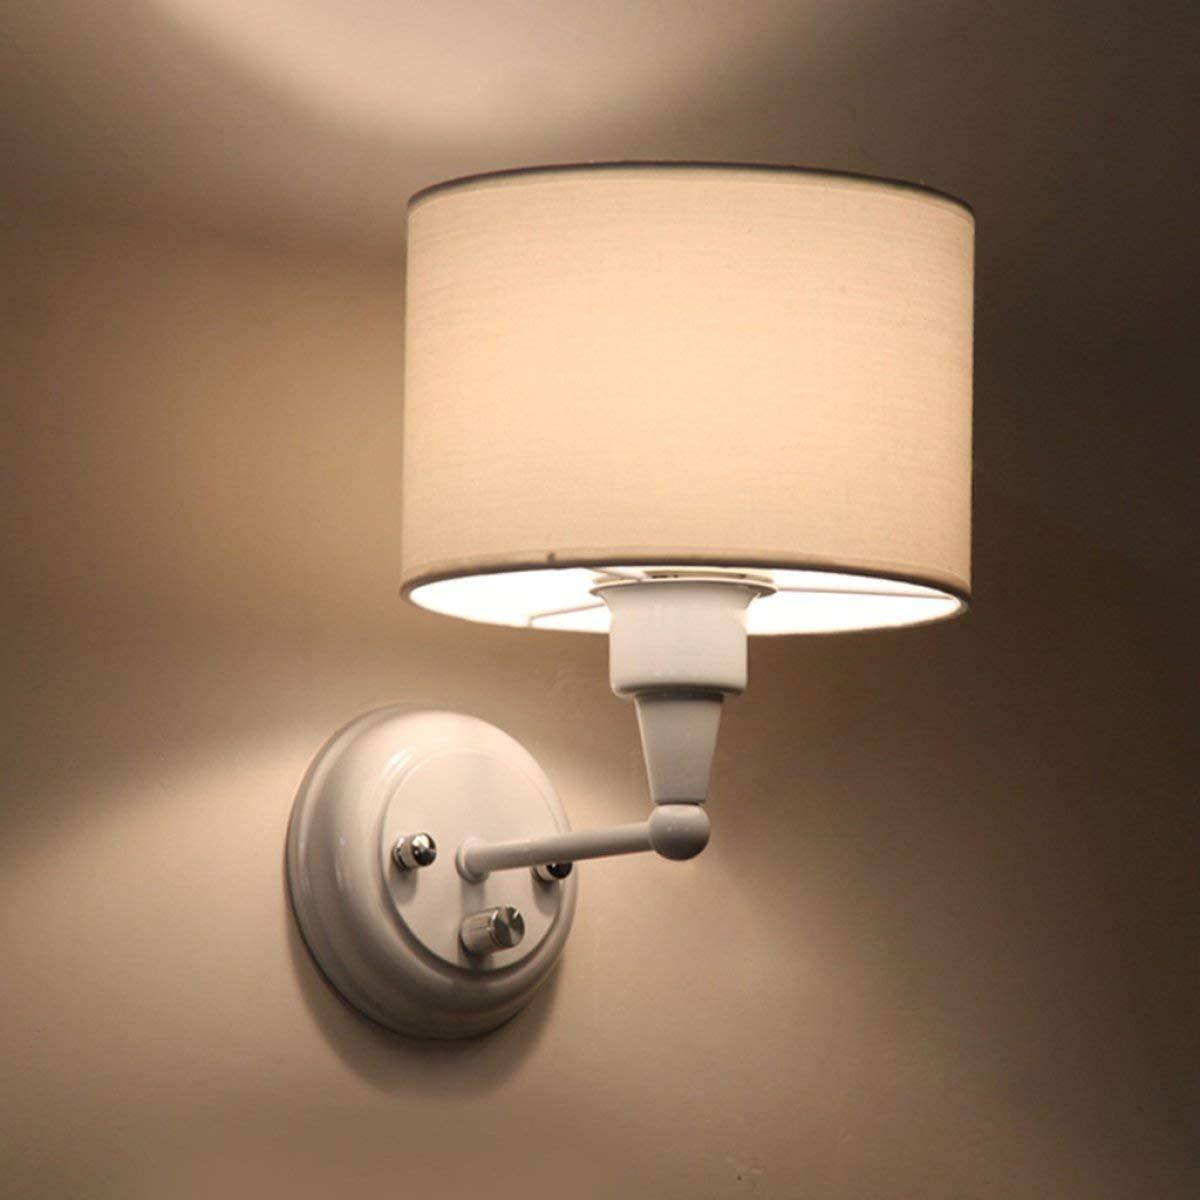 AOXISHIYE ウォールライト現代のシンプルなファッションウォールランプリビングルームの寝室クリエイティブリネン暖かいウォールランプ調光ベッドサイドランプウォールランプ B07S7N8WXZ